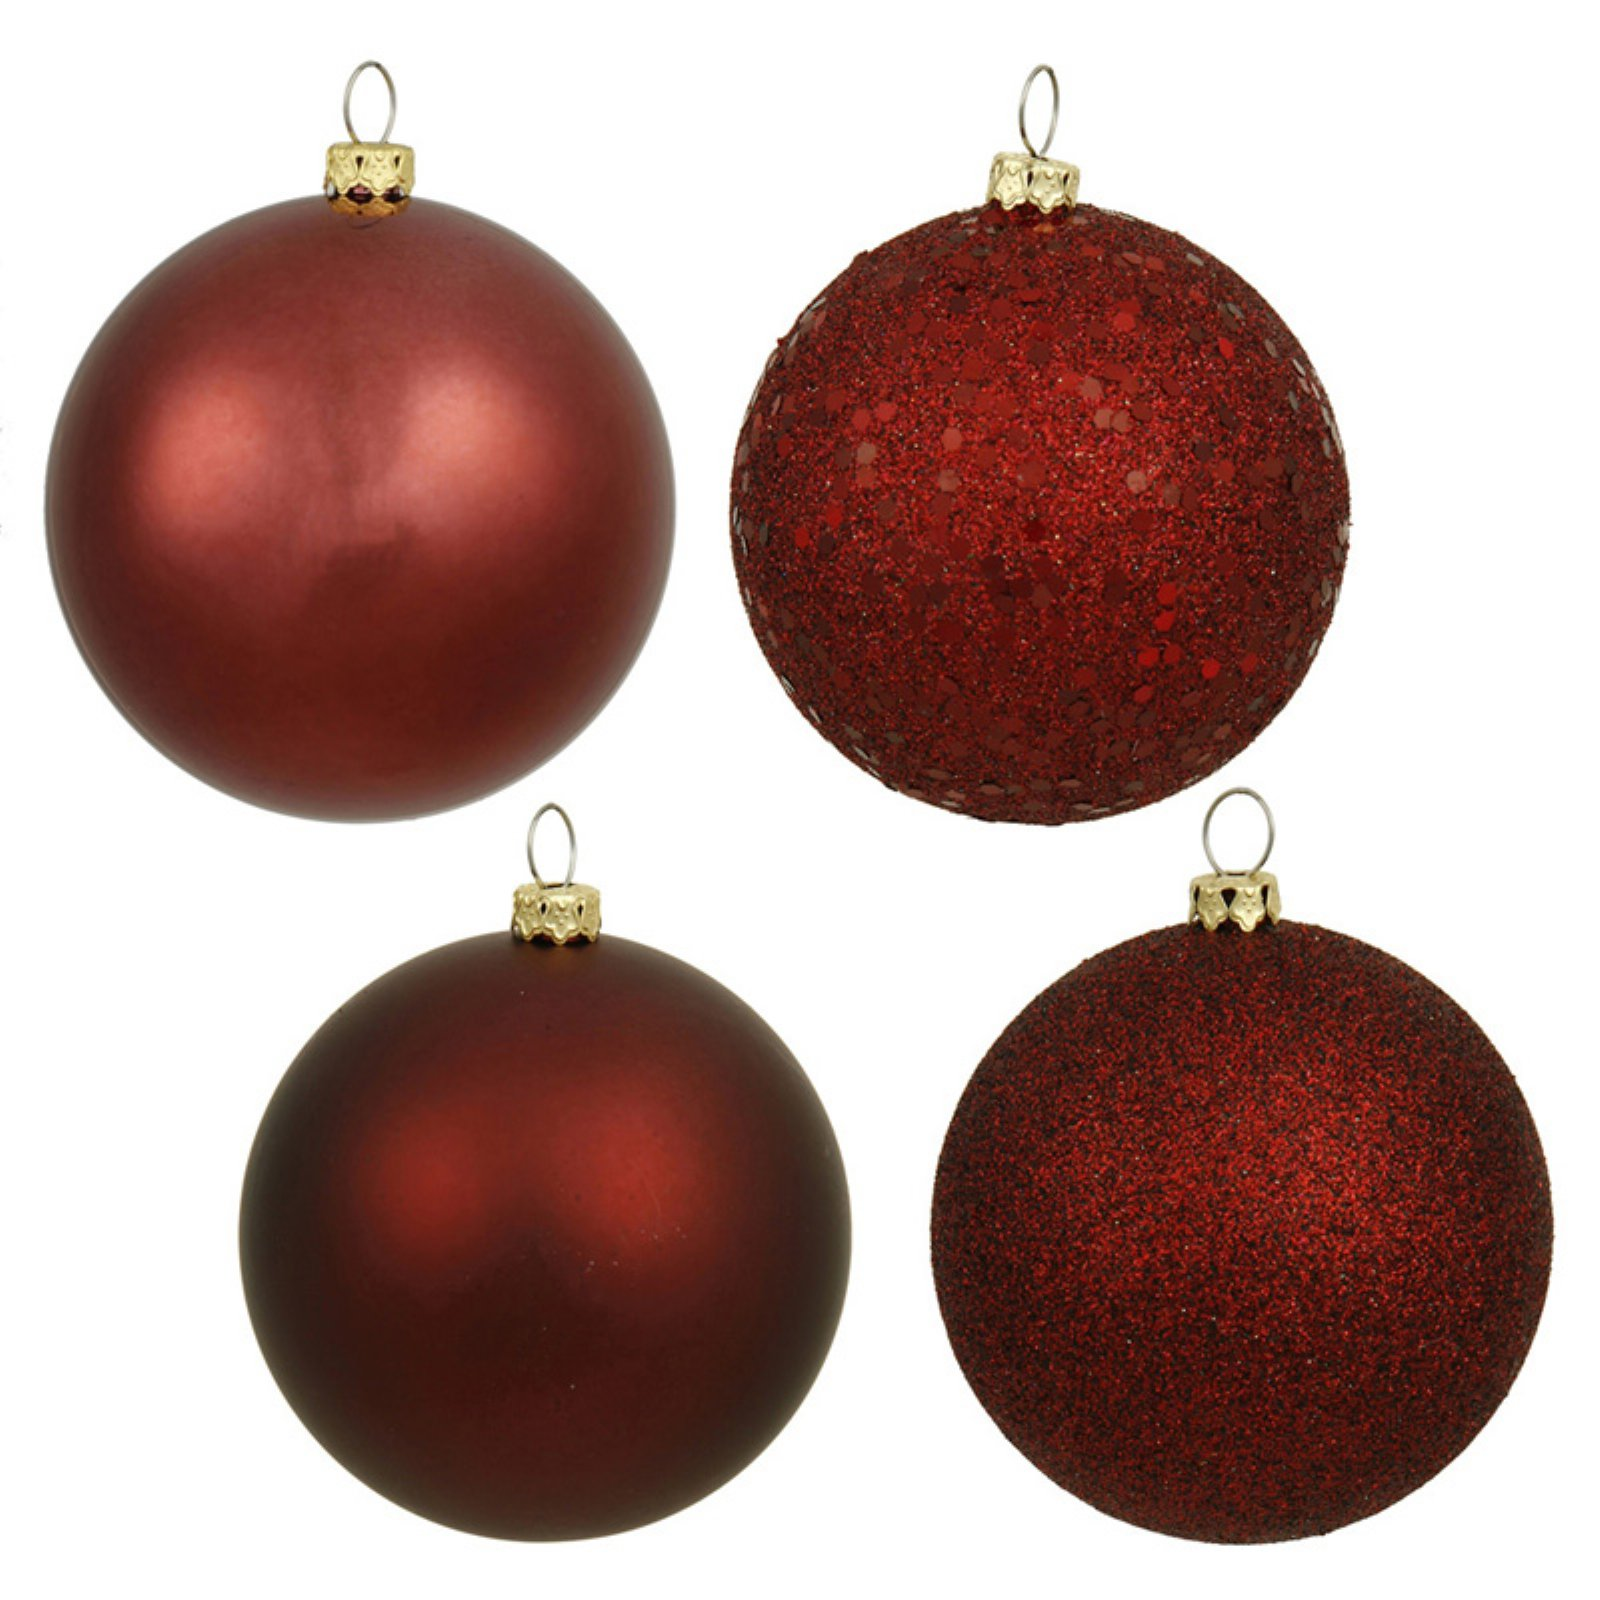 "Vickerman 6"" Ball Christmas Ornaments, Pack of 4"